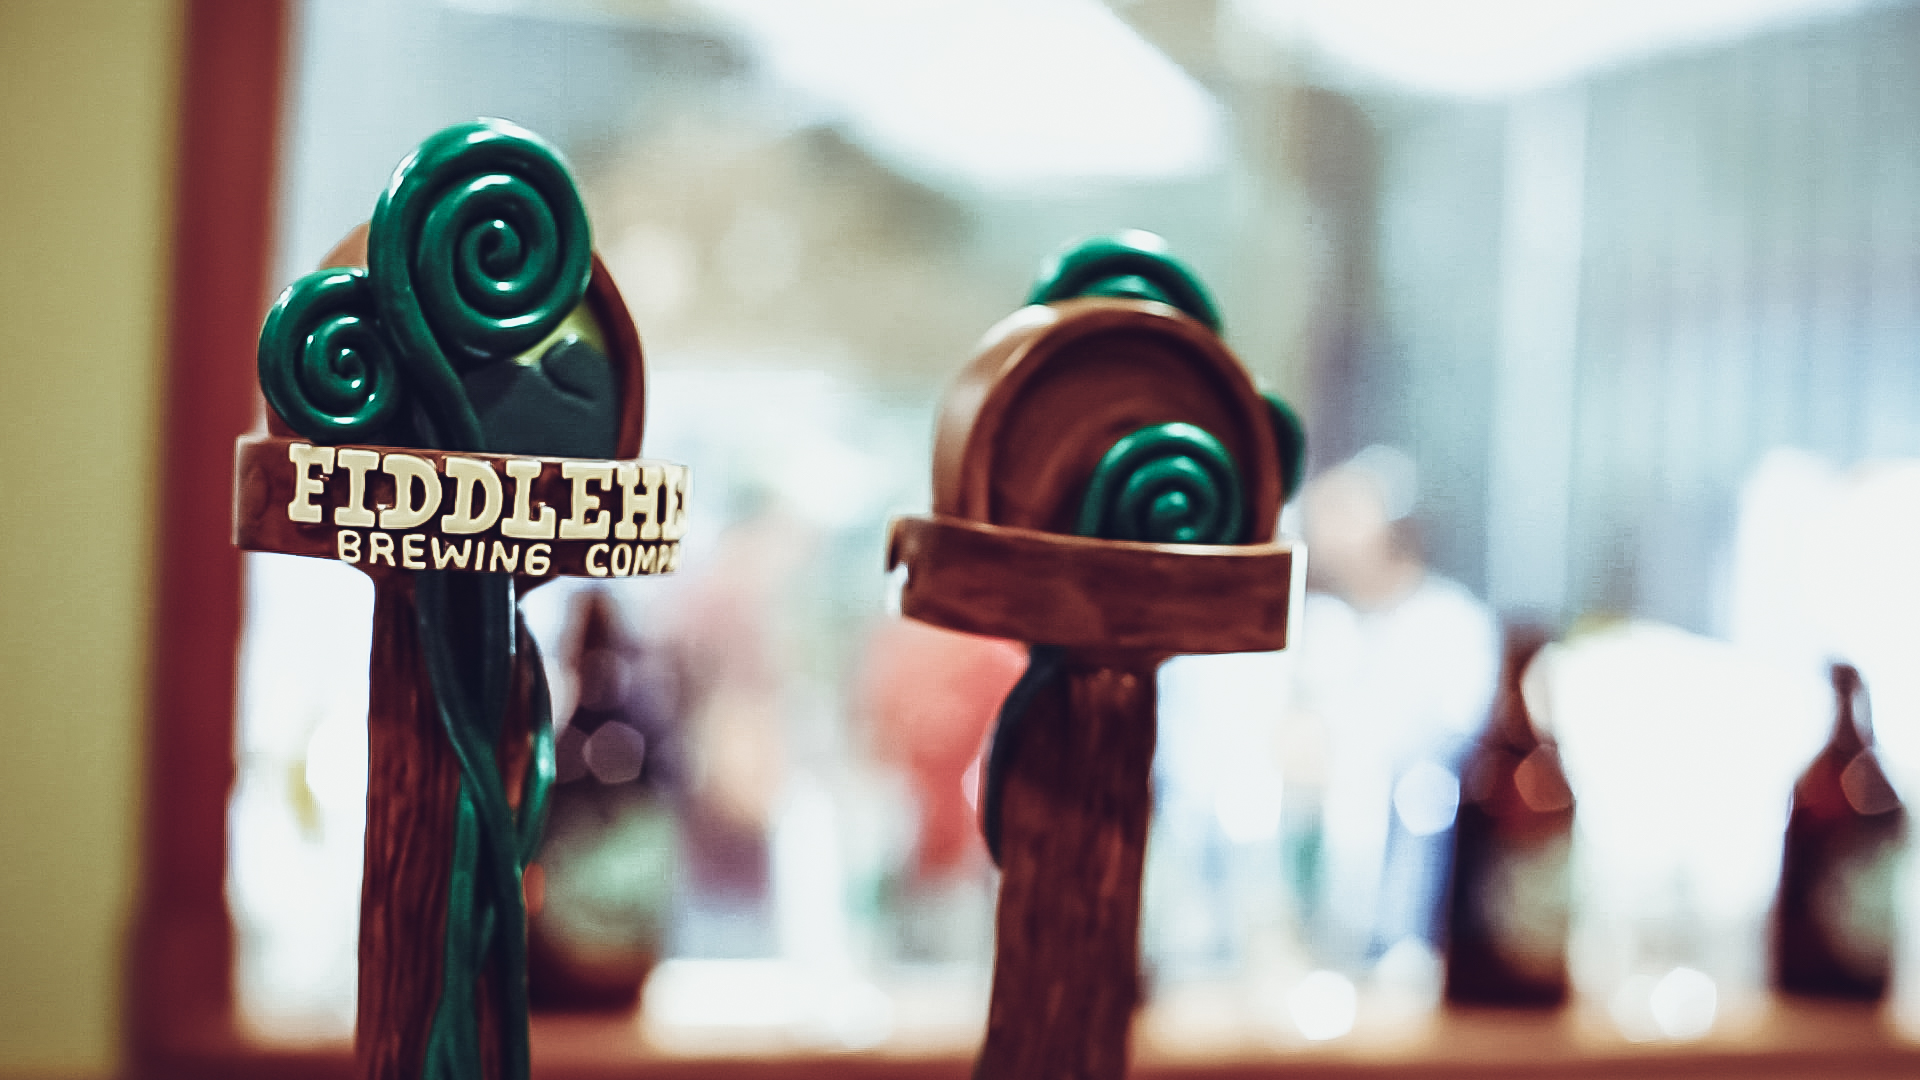 Fiddlehead Brewing tap handles